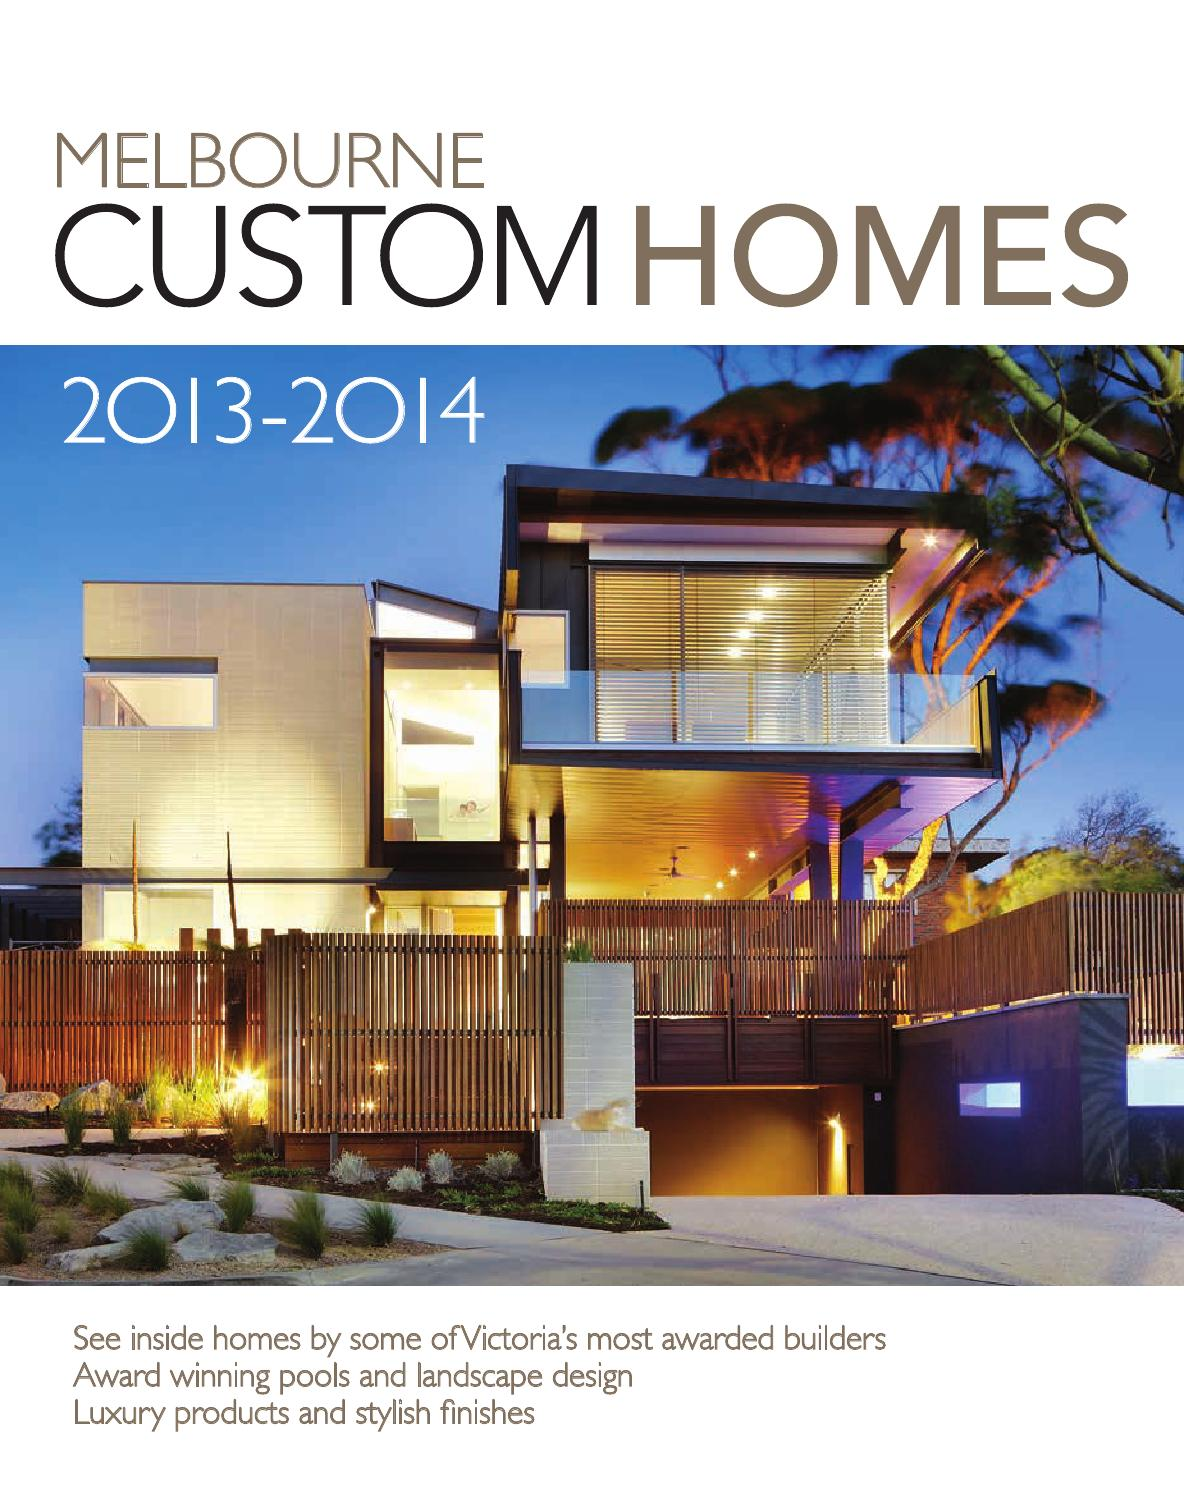 2014 Master Builders Victoria Winning Homes Magazine by ark:media - issuu